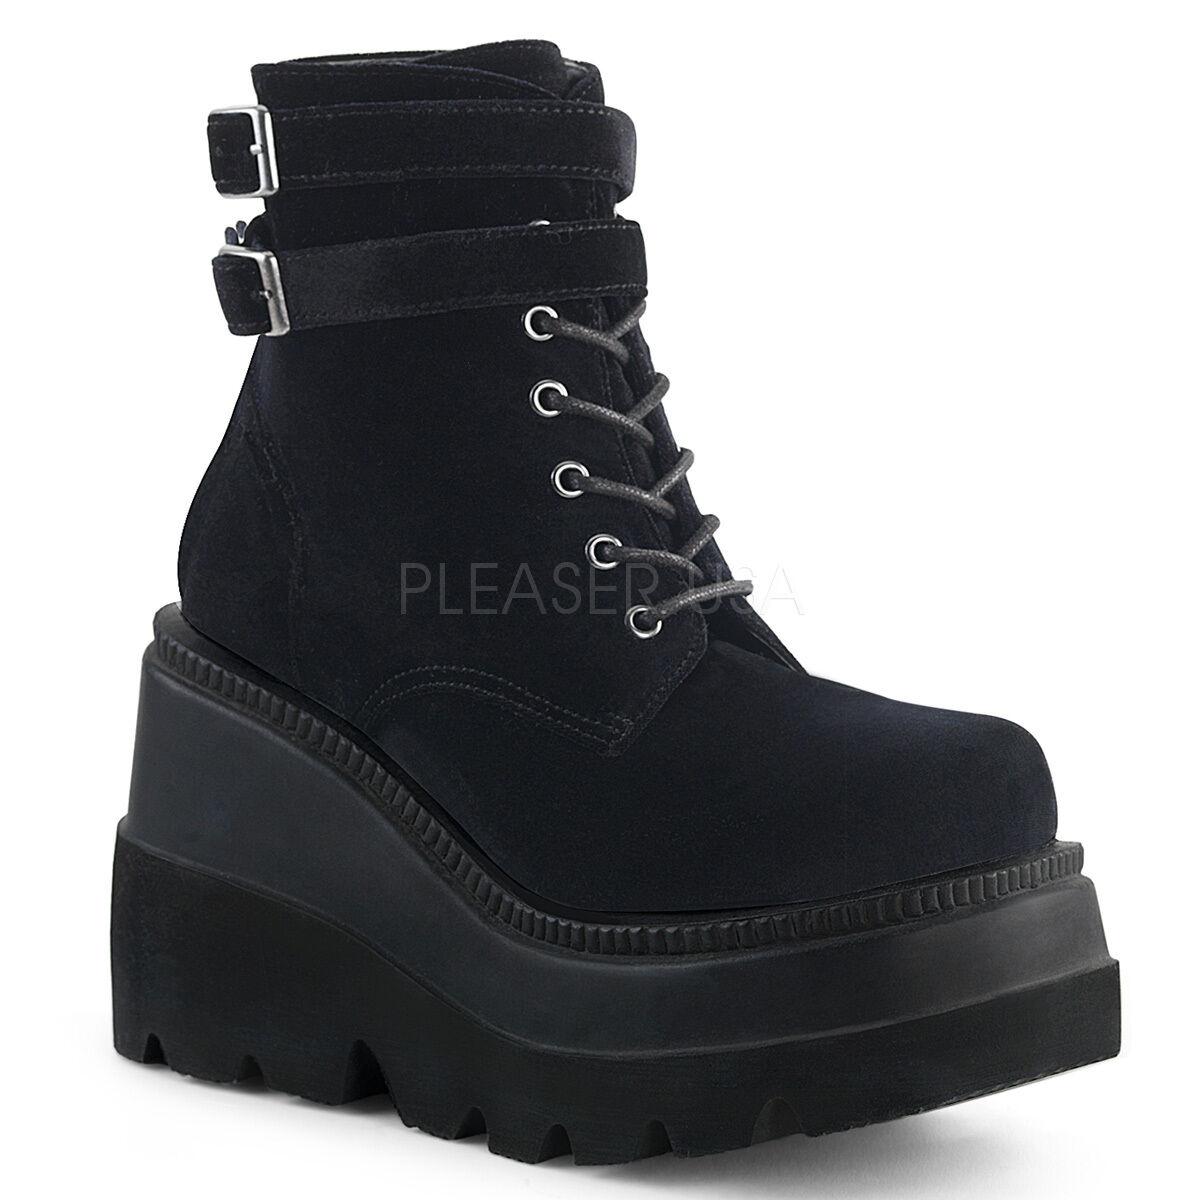 Demonia SHAKER-50 52 52 52 55 damen Wedge Platform Ankle Stiefel 0c189a